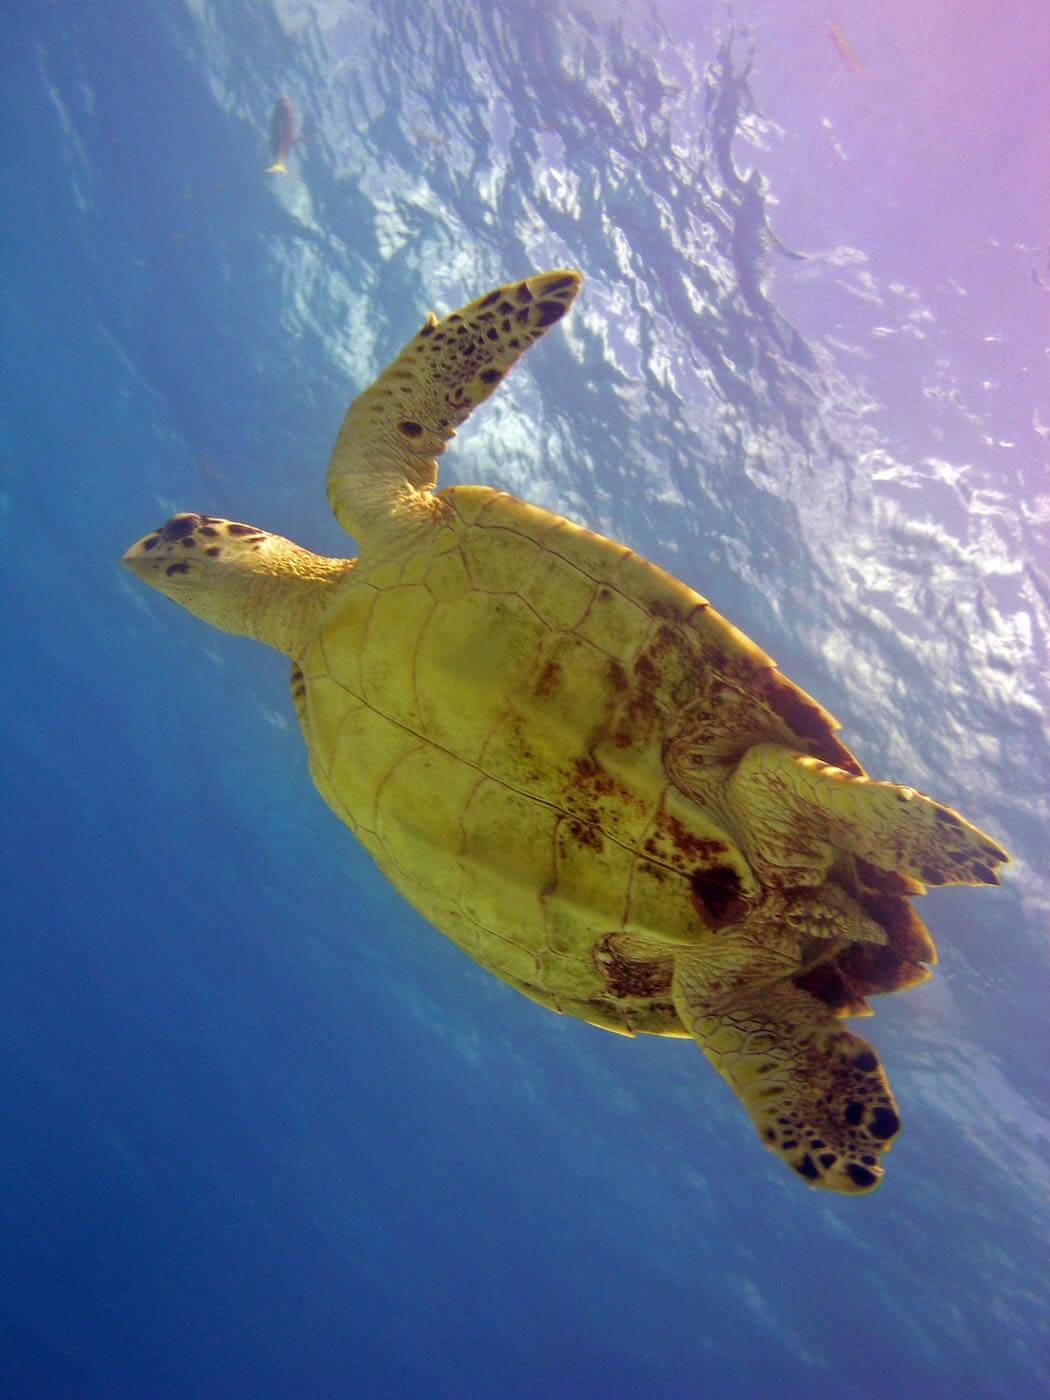 Isla Mujeres Sea Turtle Snorkeling Scuba Diving Squalo Adventures-12